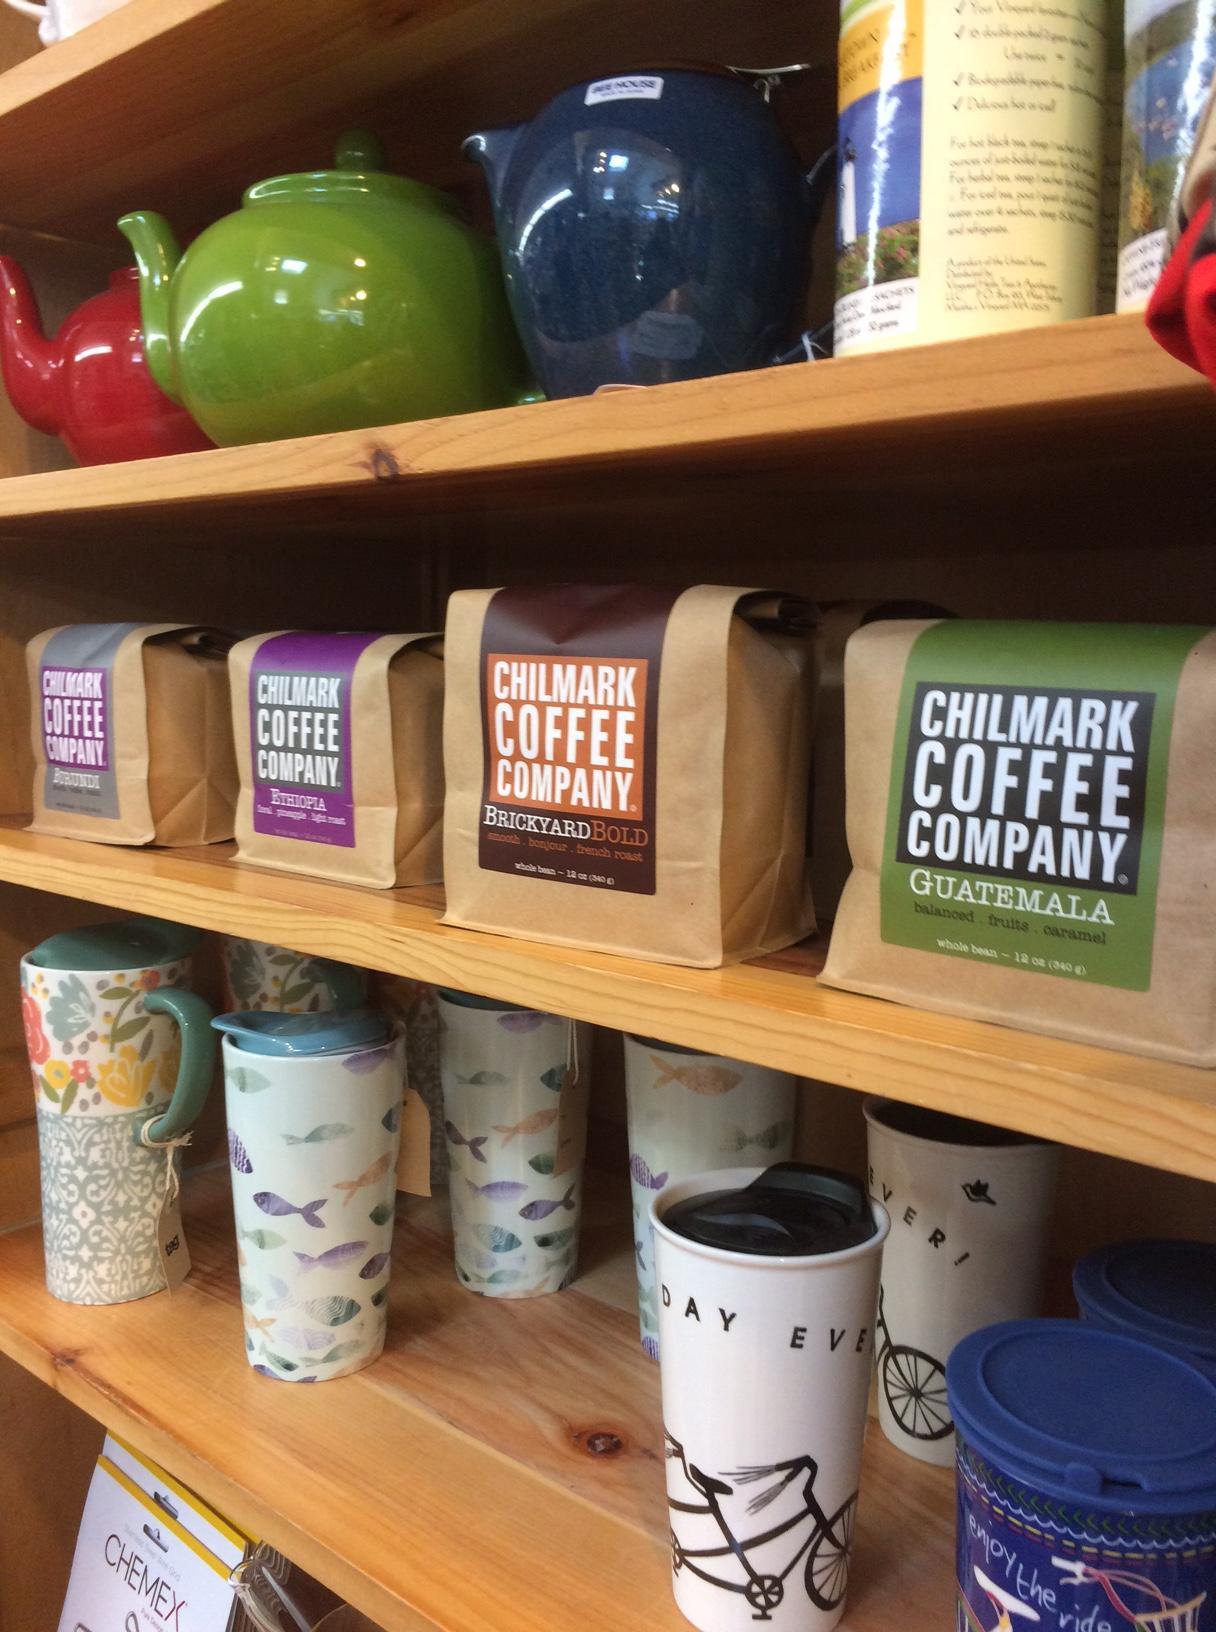 Chilmark Coffee